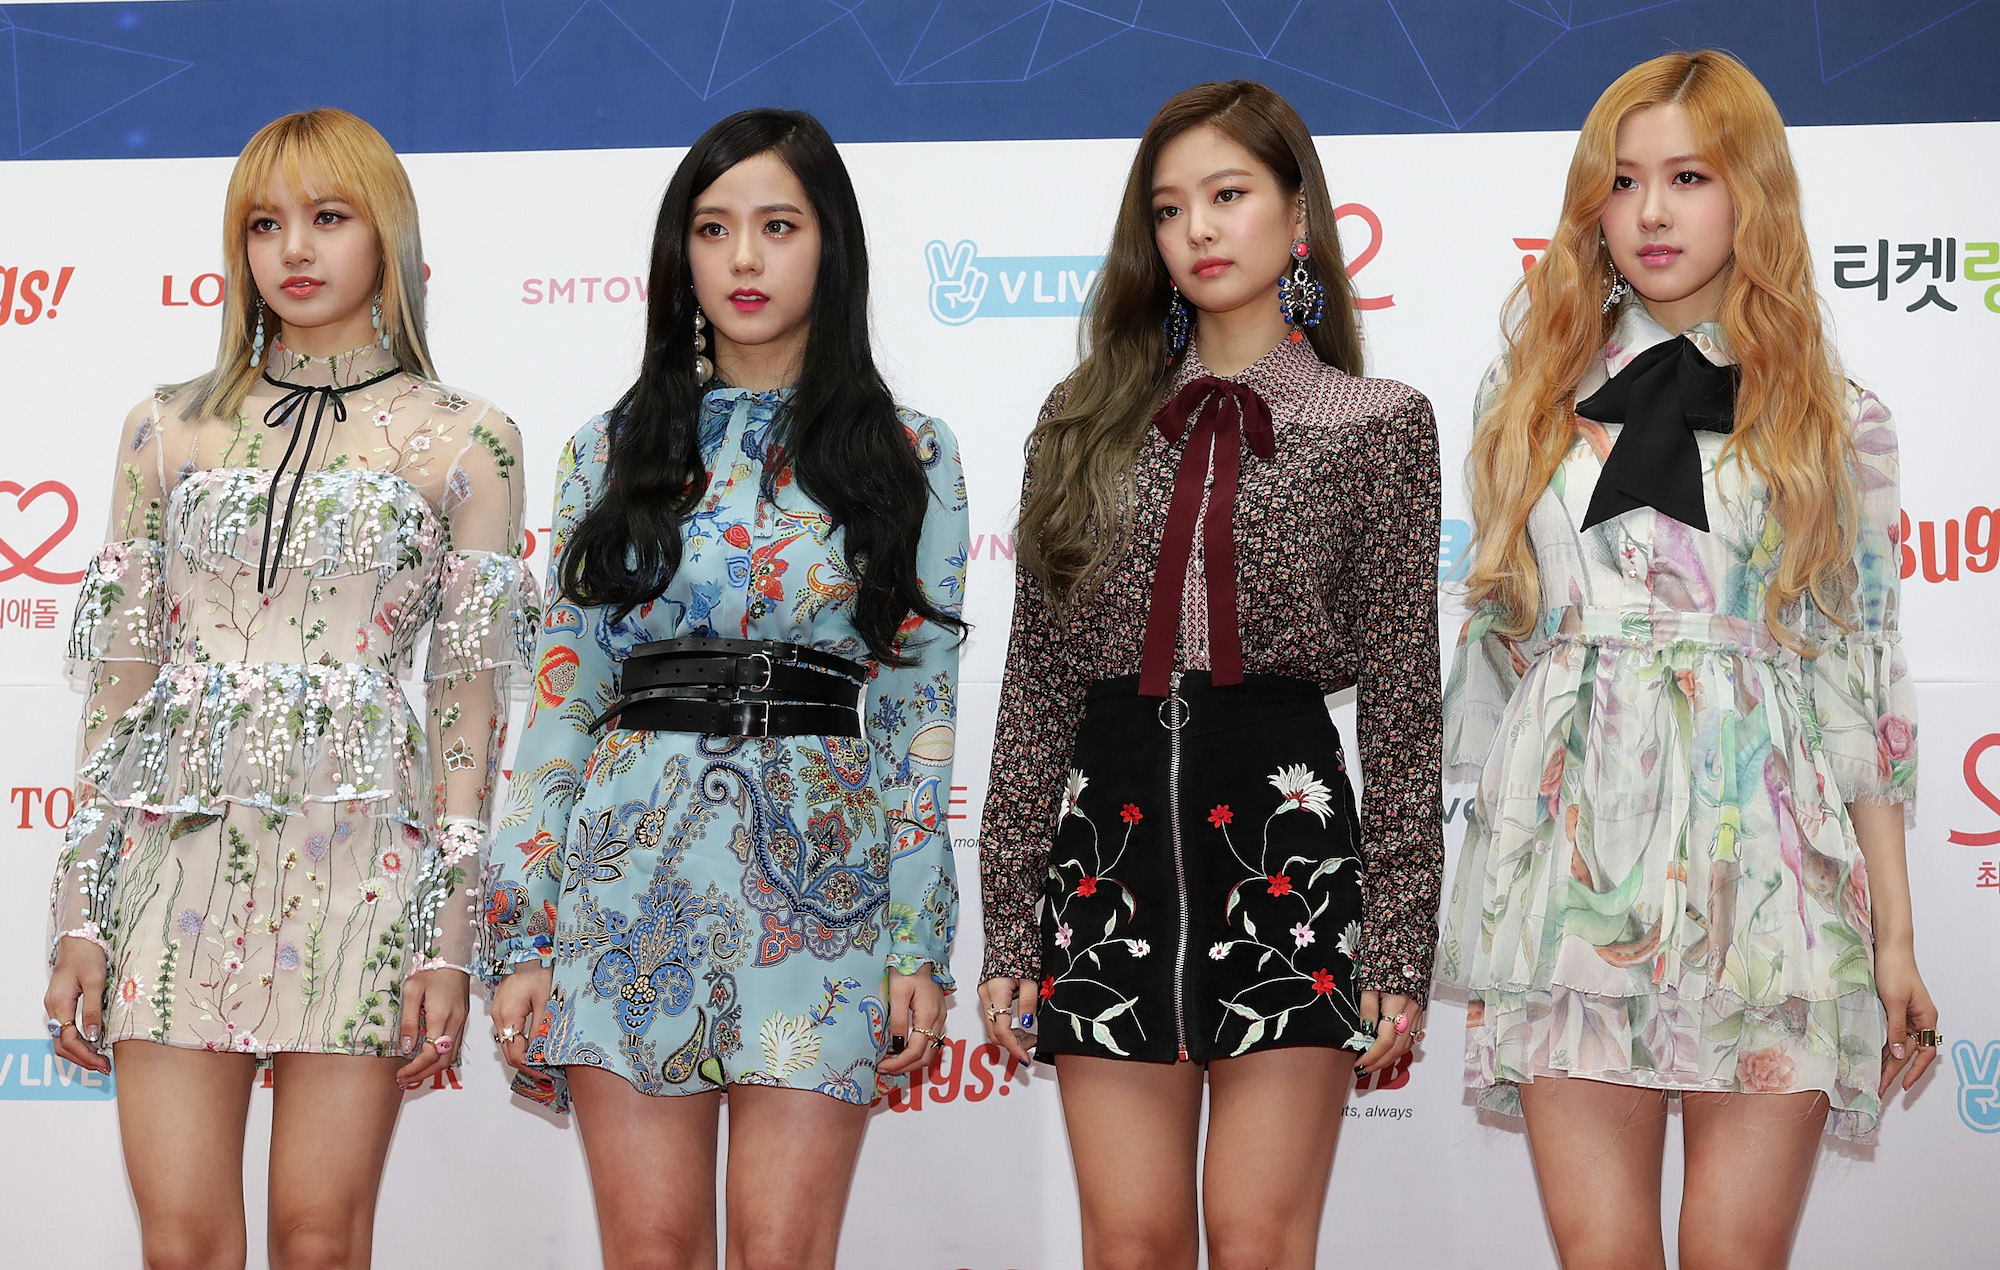 The 6th Gaon Chart K-Pop Awards